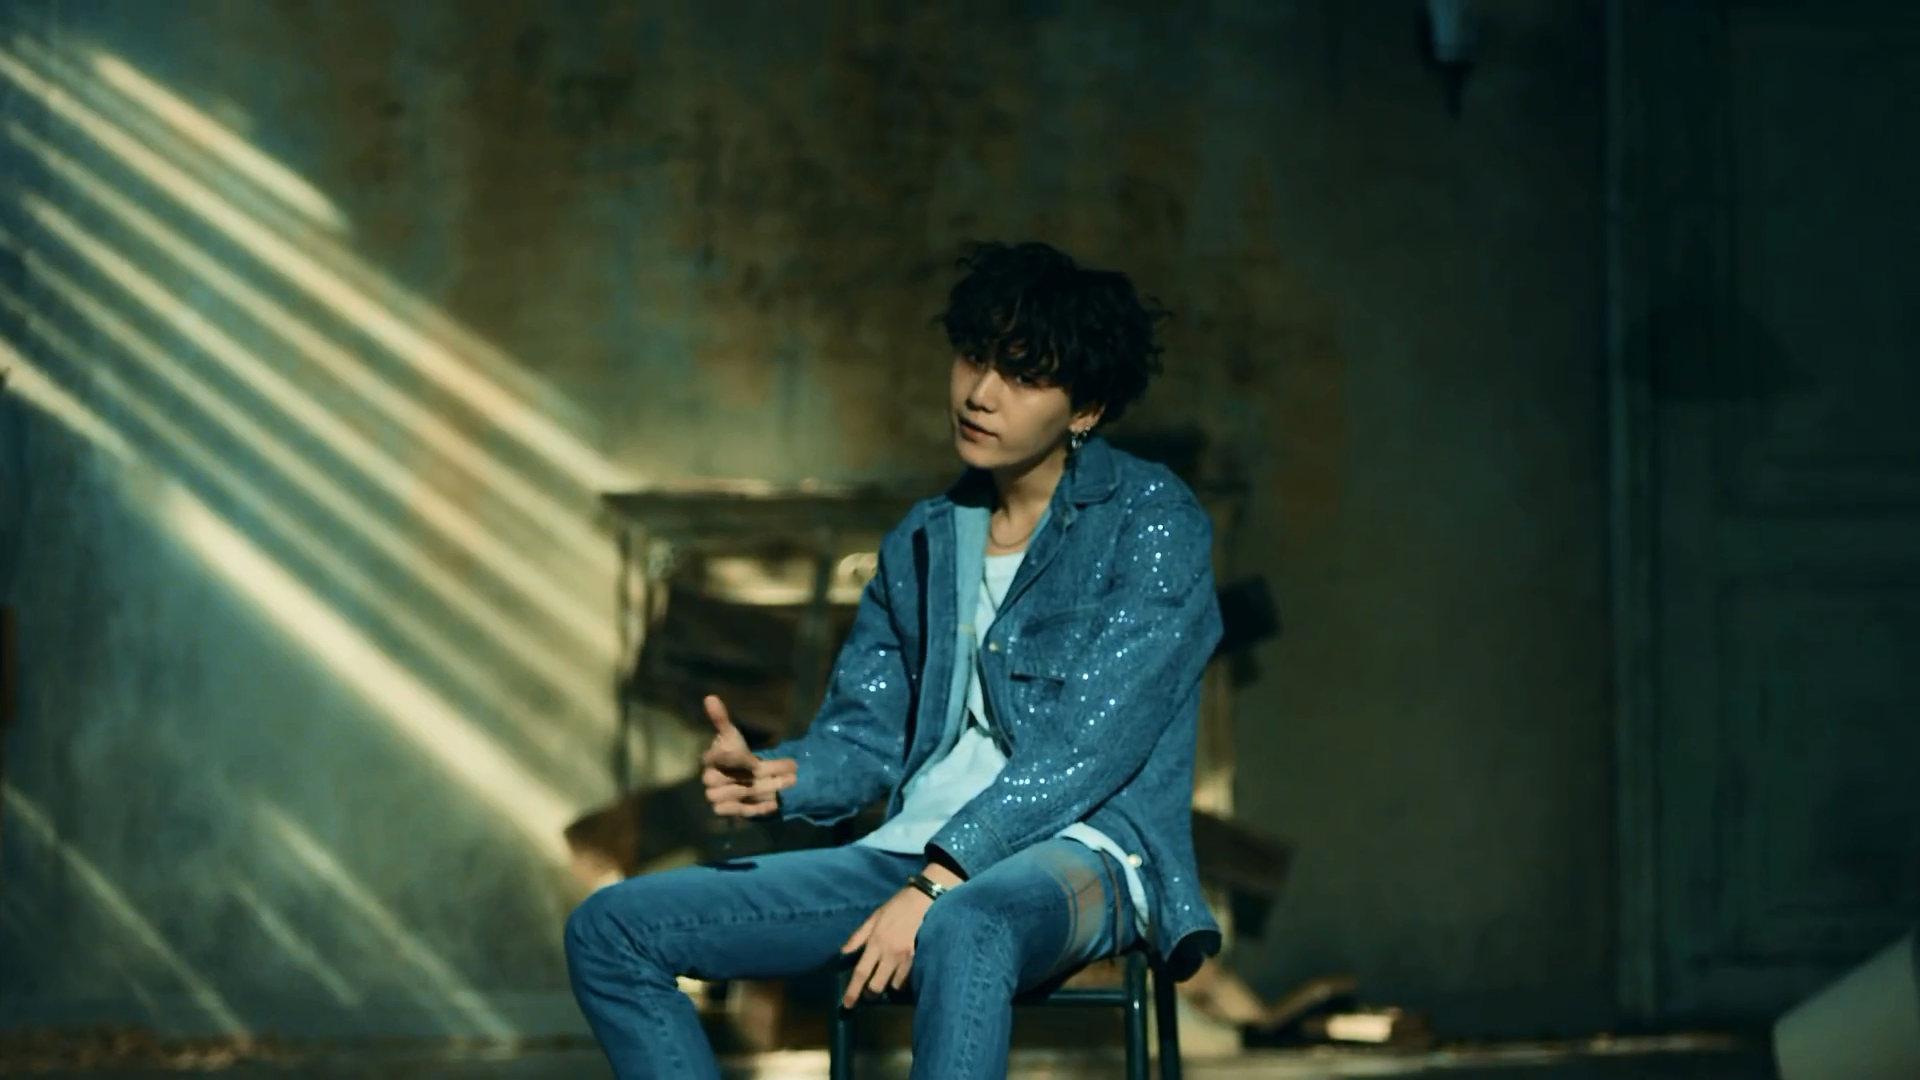 BTS - Fake Love who's who - K-Pop Database / dbkpop.com